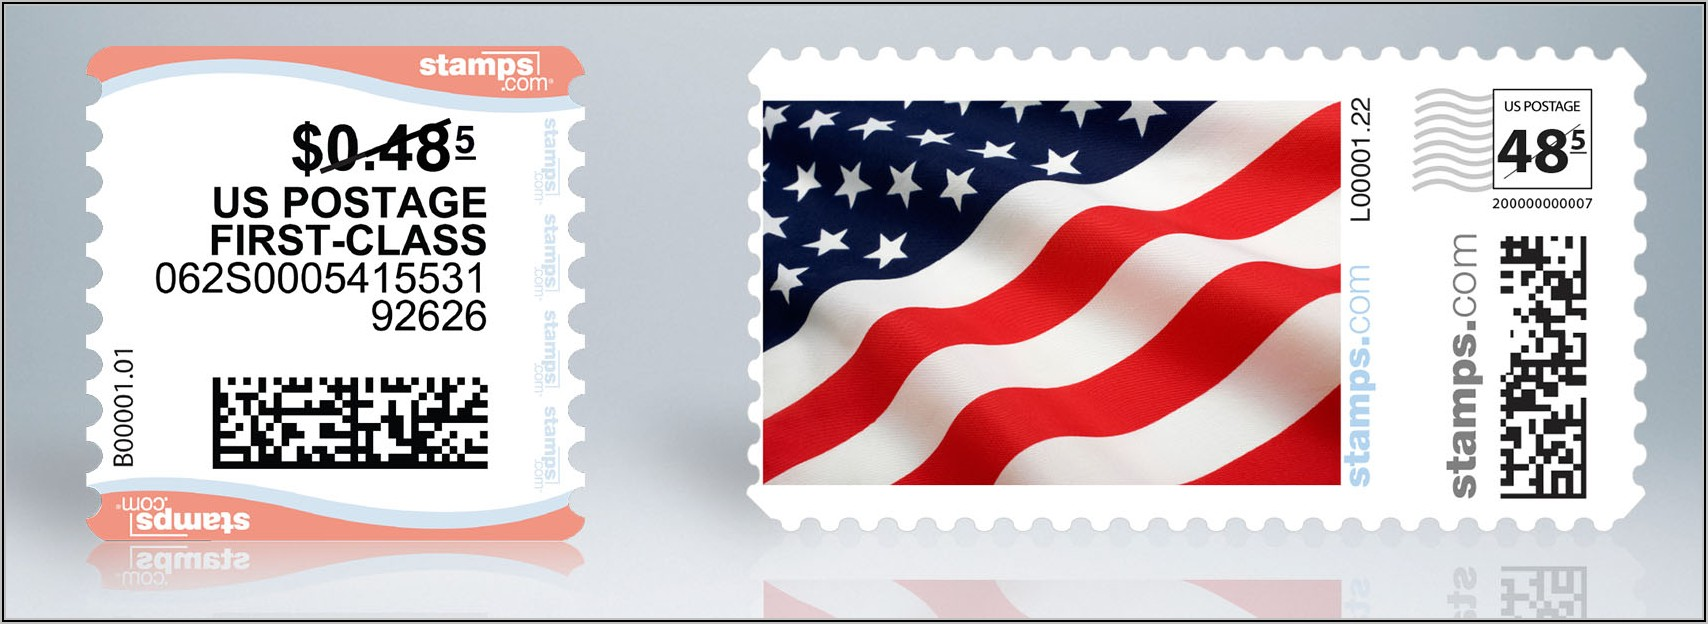 Usps Print Postage On Envelope